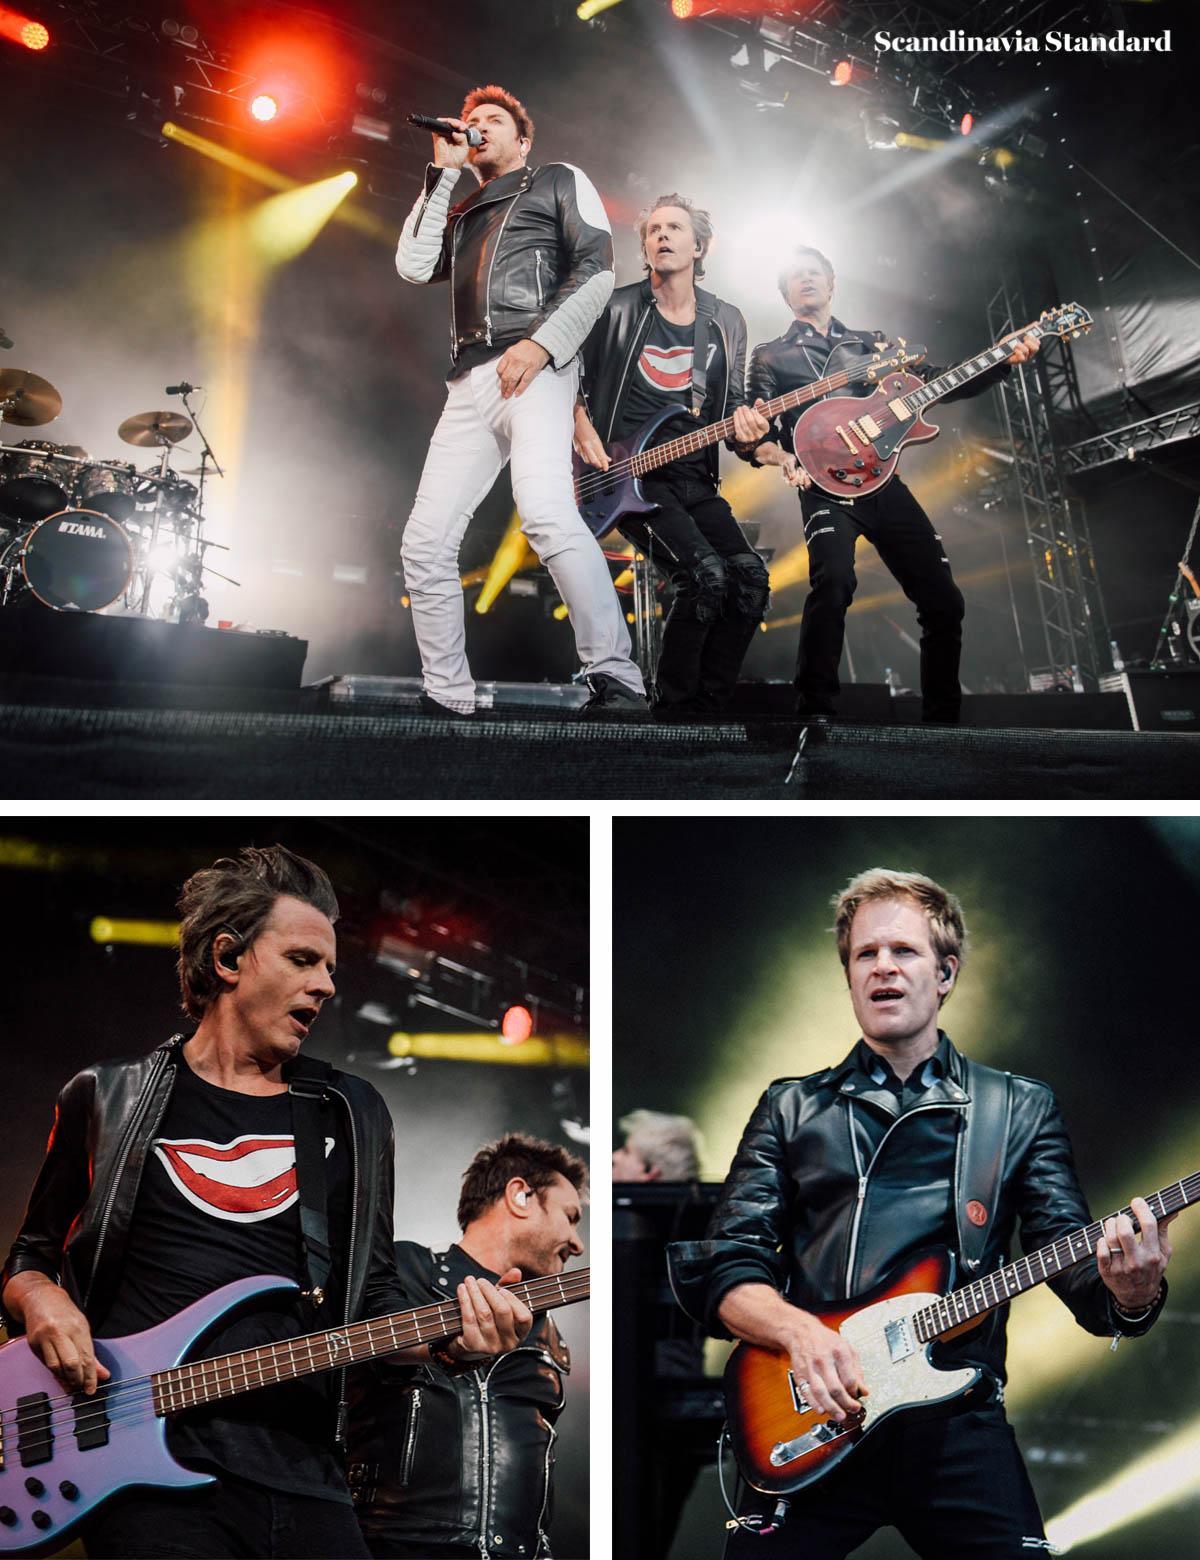 Northside Festival - Duran Duran